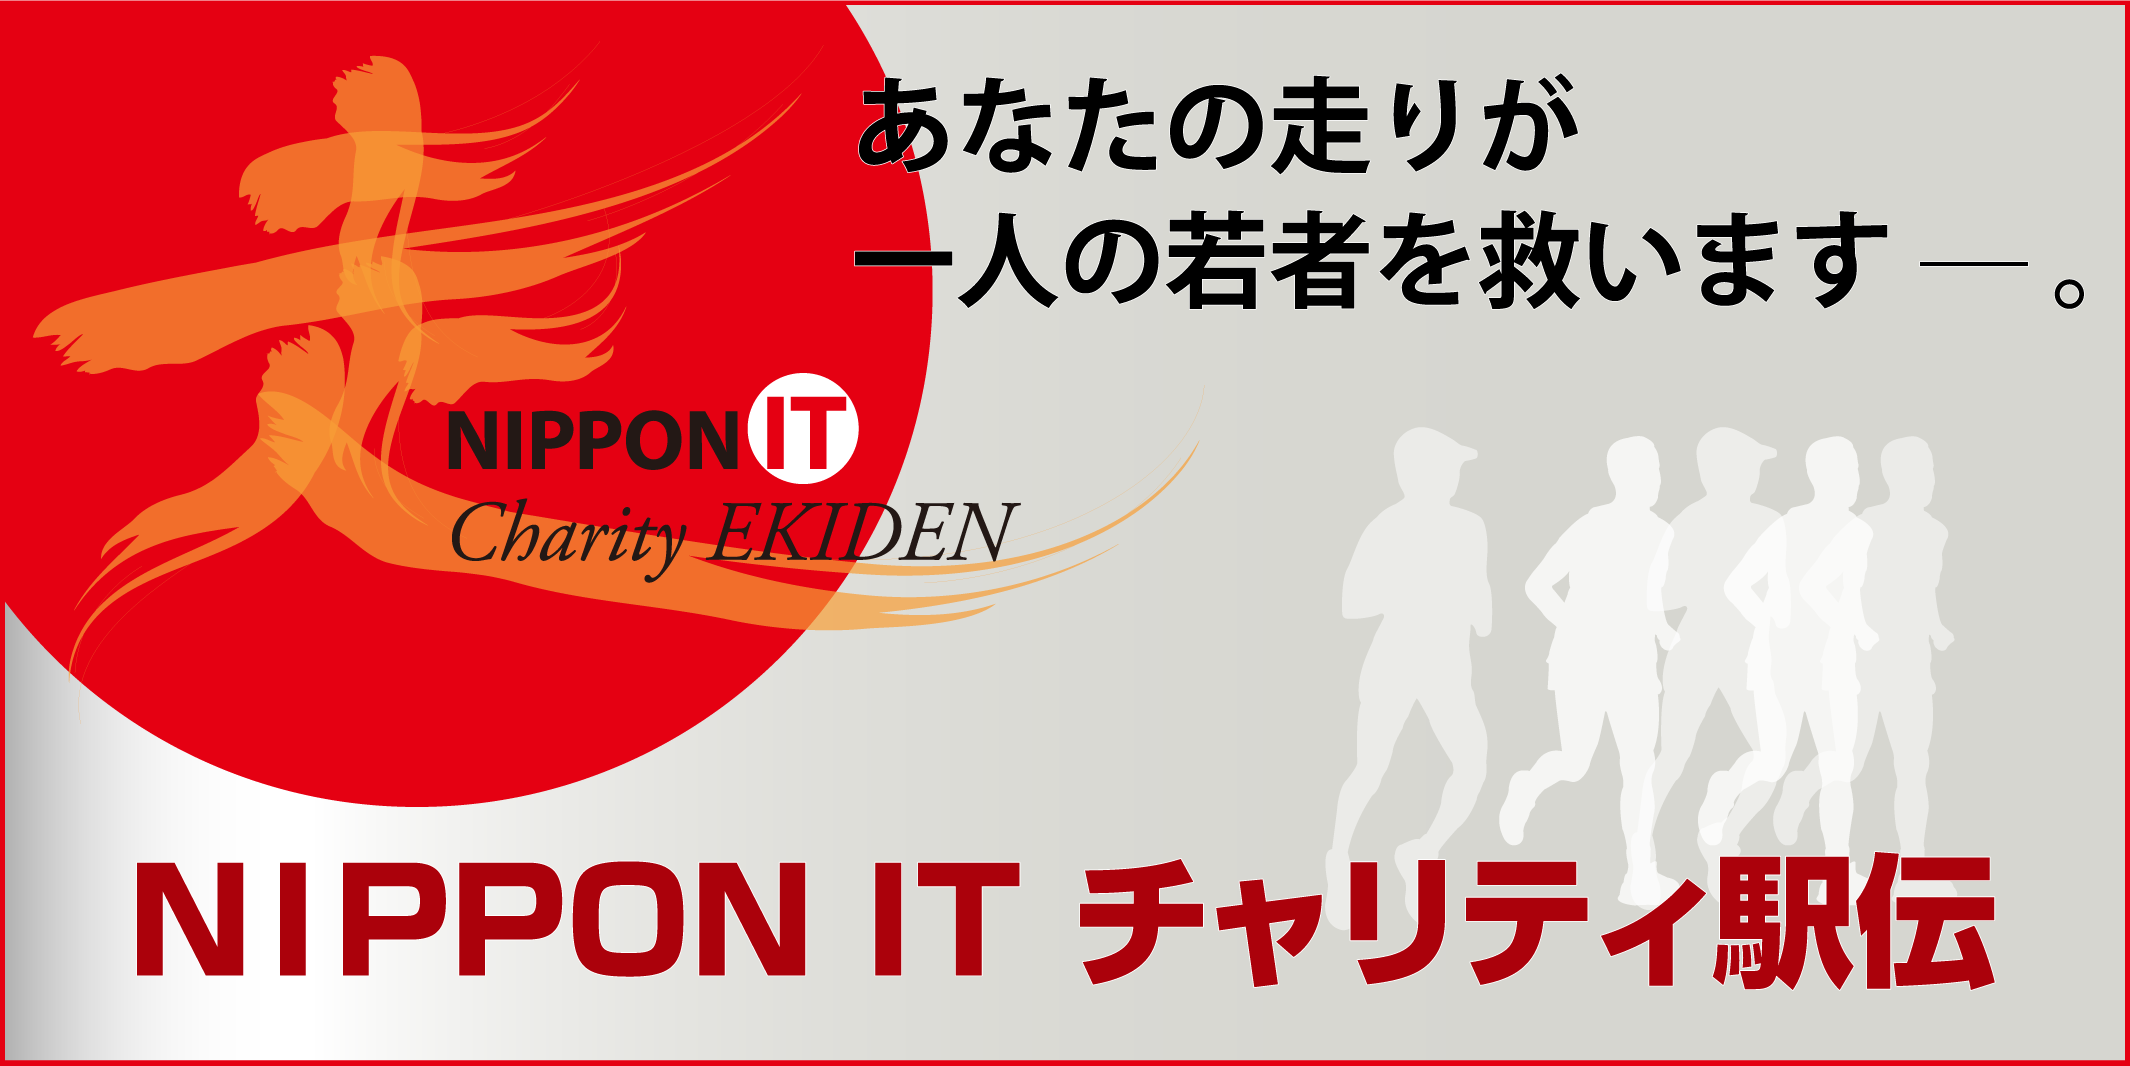 NIPPON IT チャリティ駅伝2017